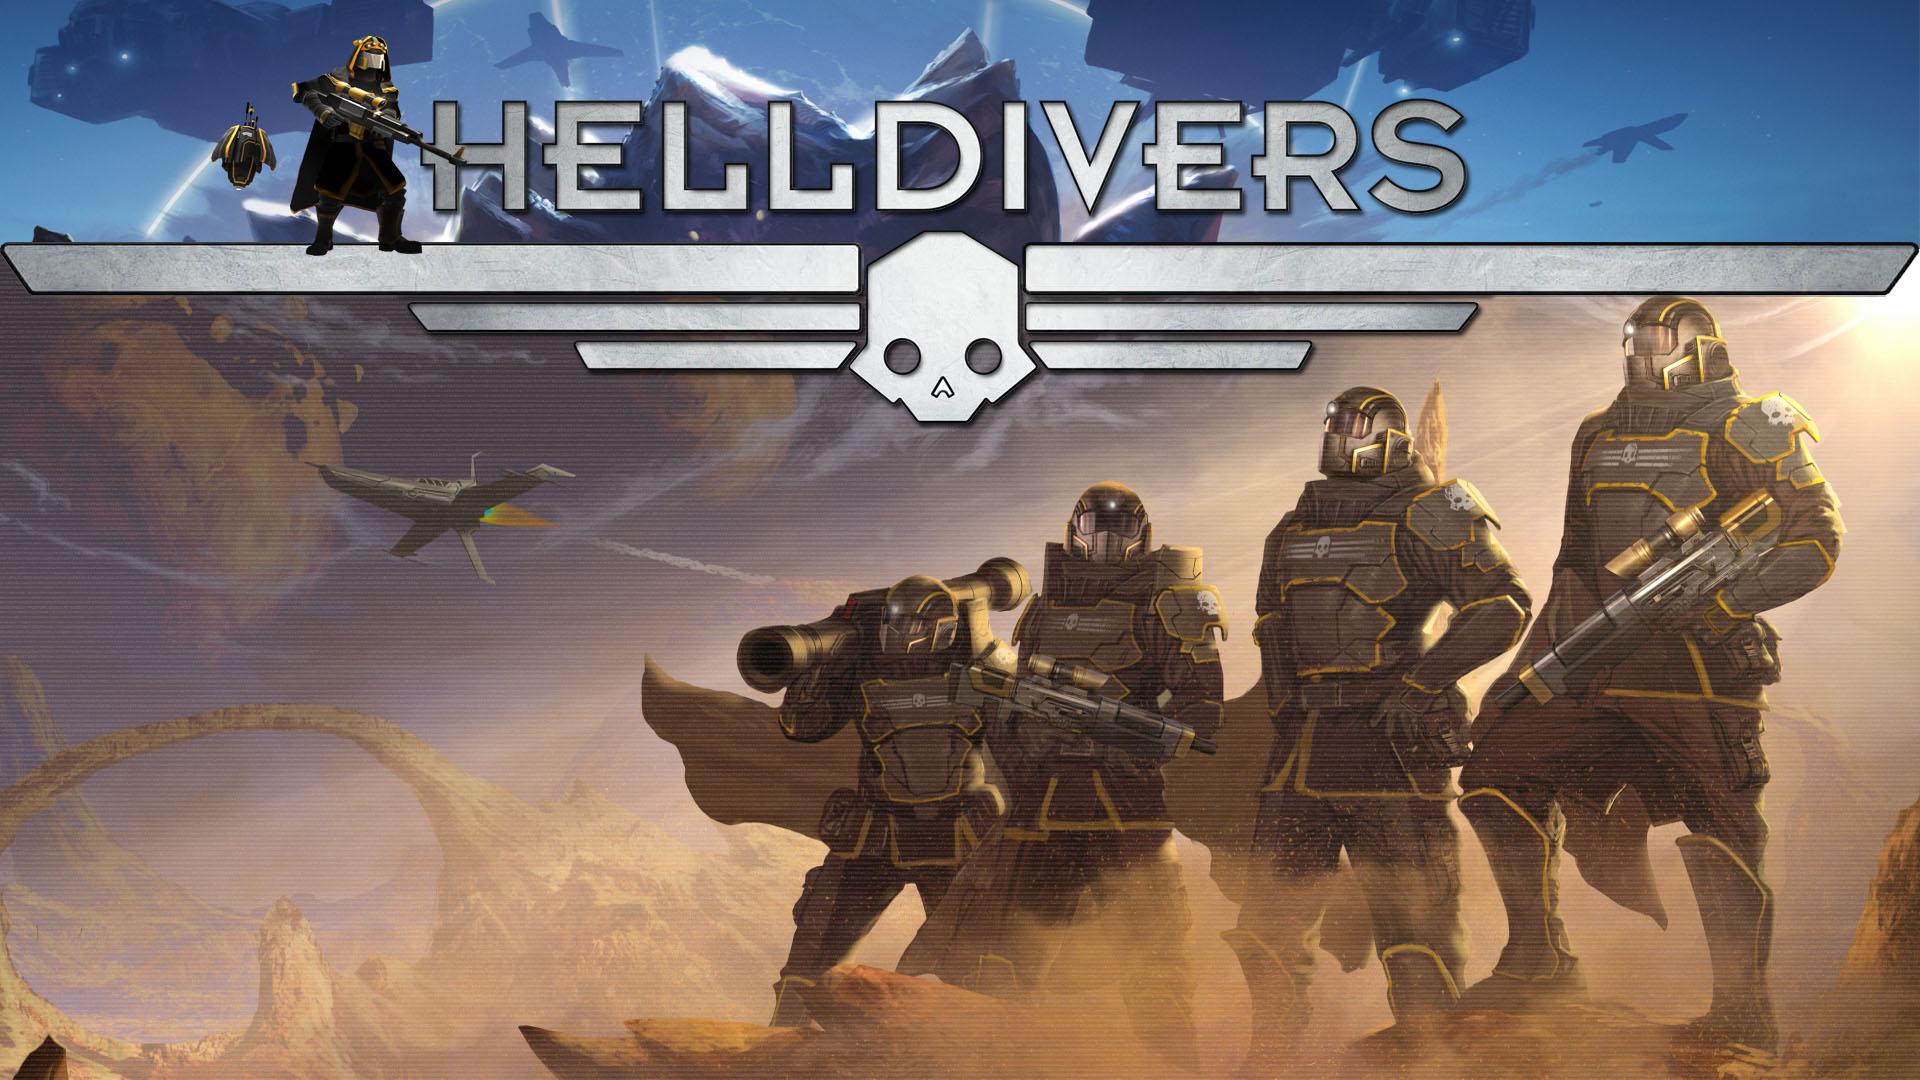 Helldivers Desktop wallpapers